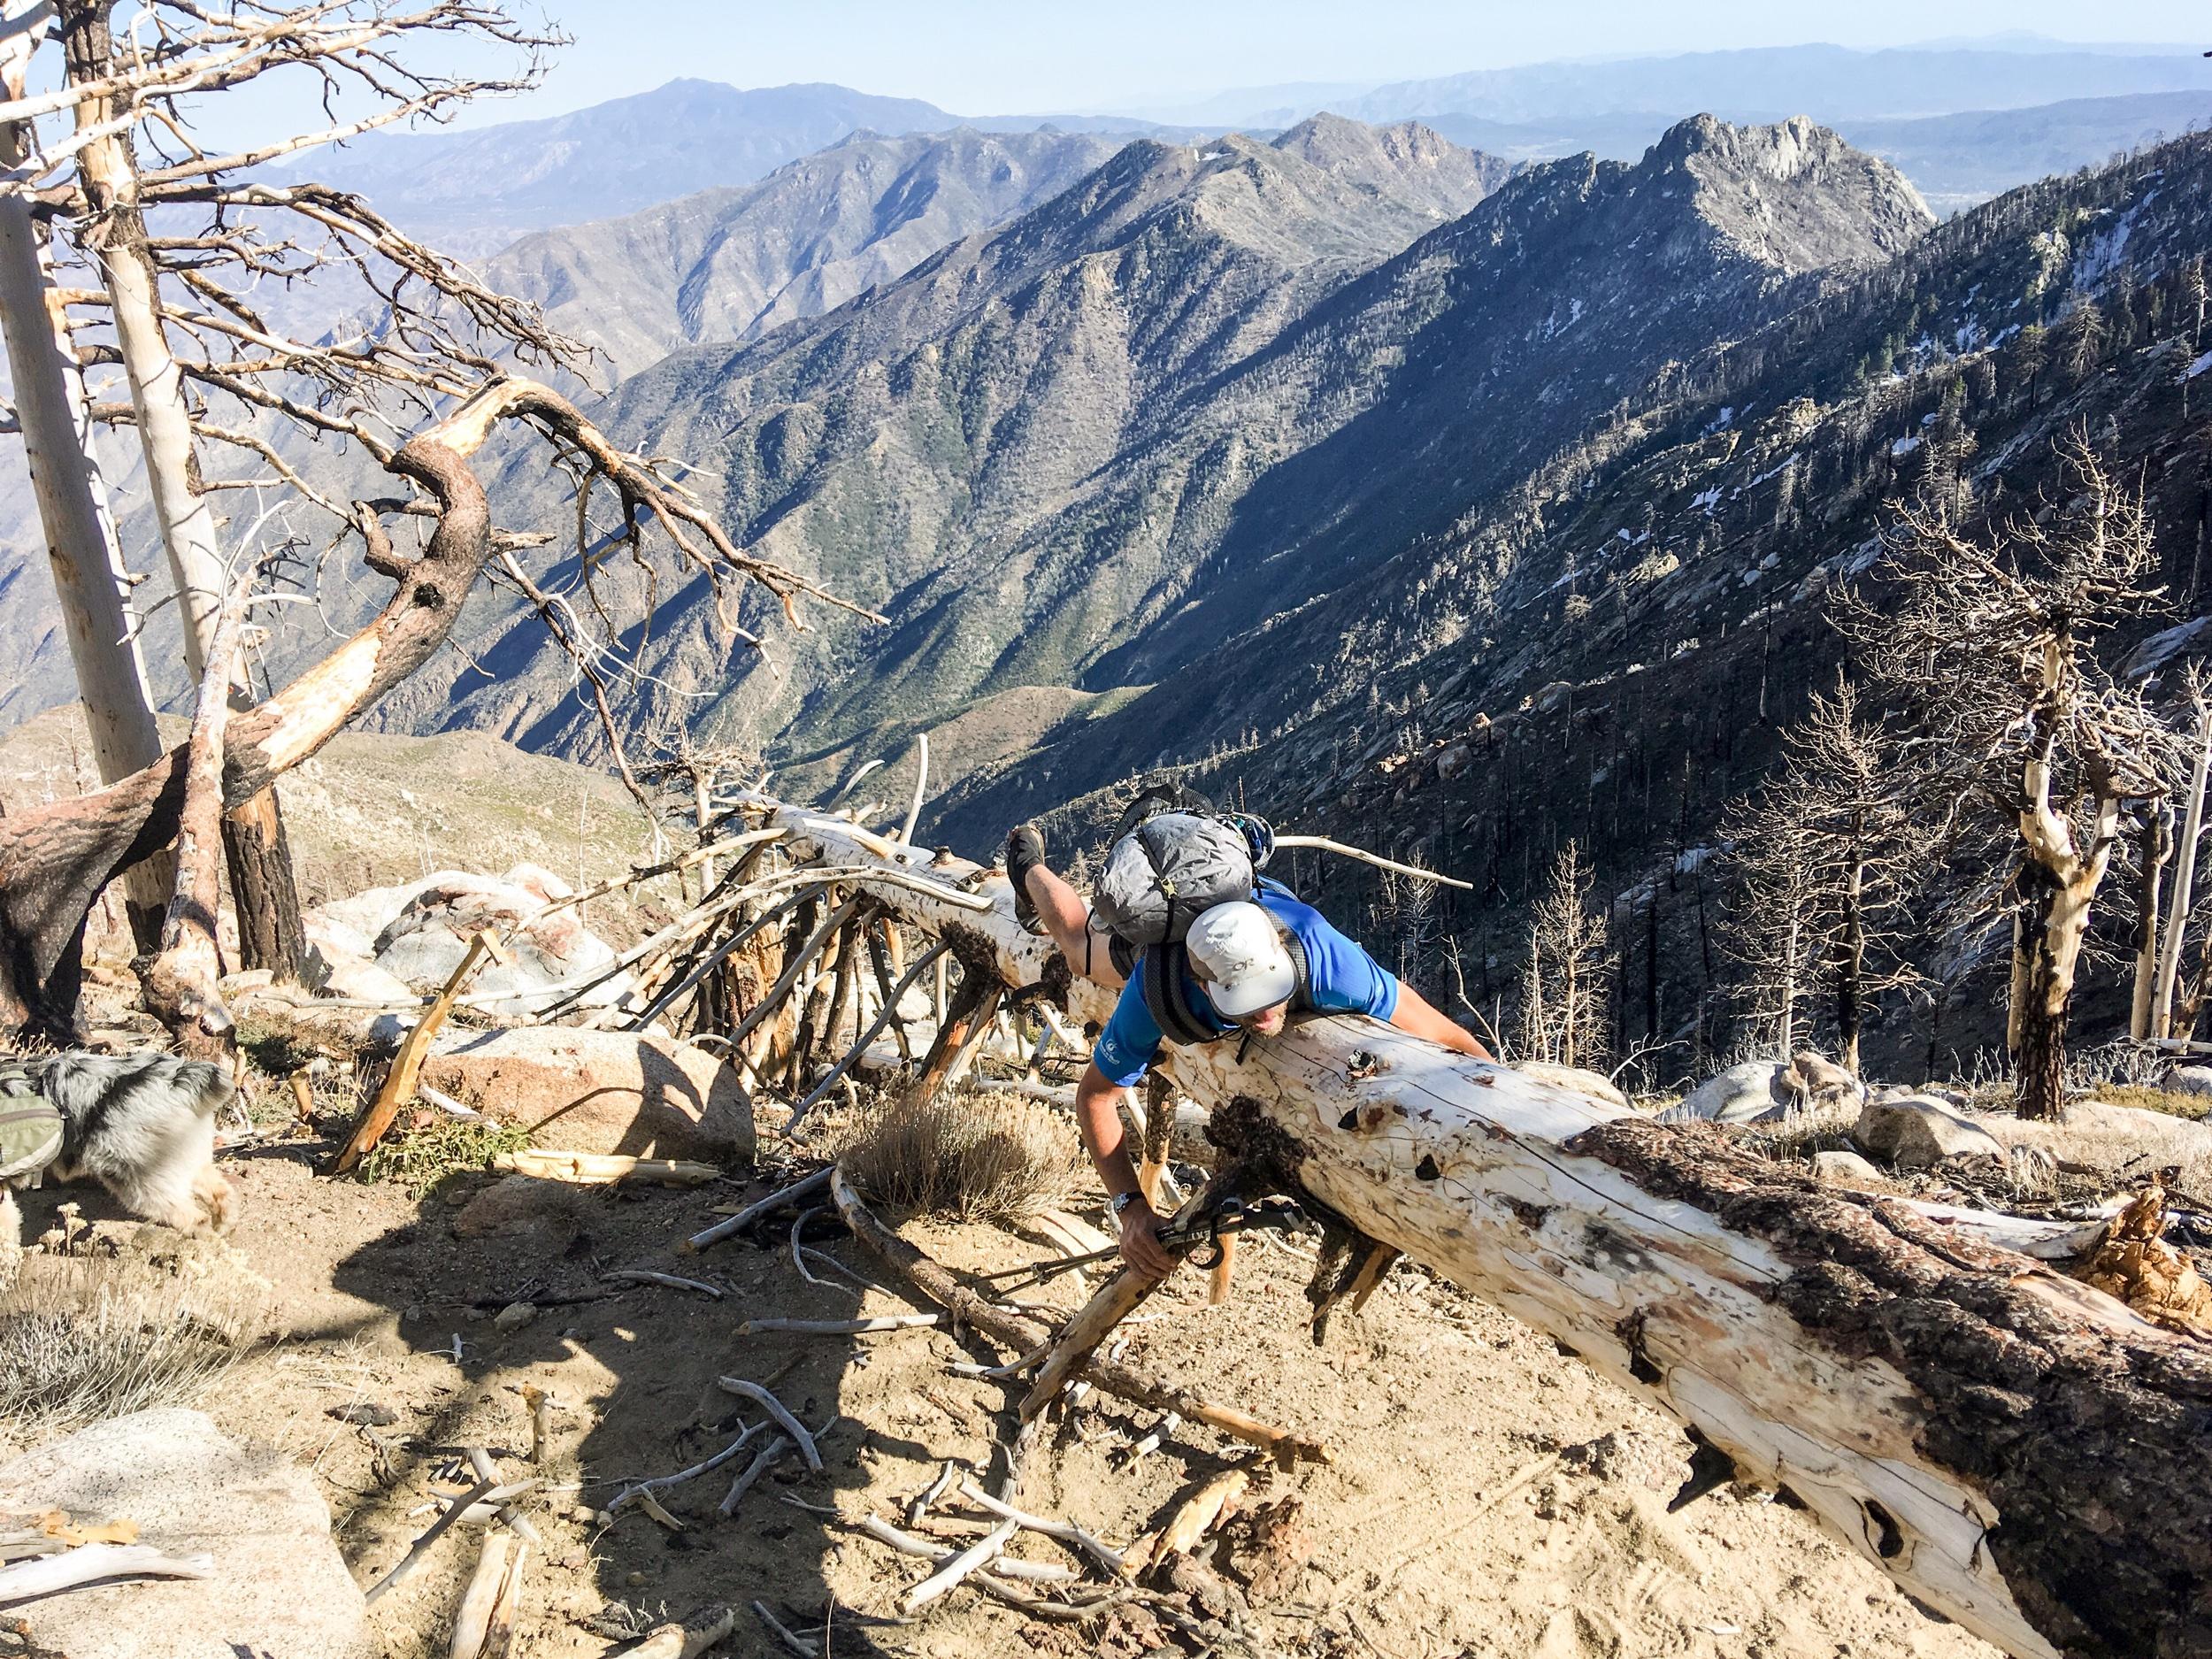 Mountain Fire Closure - San Jacinto Wilderness, CA